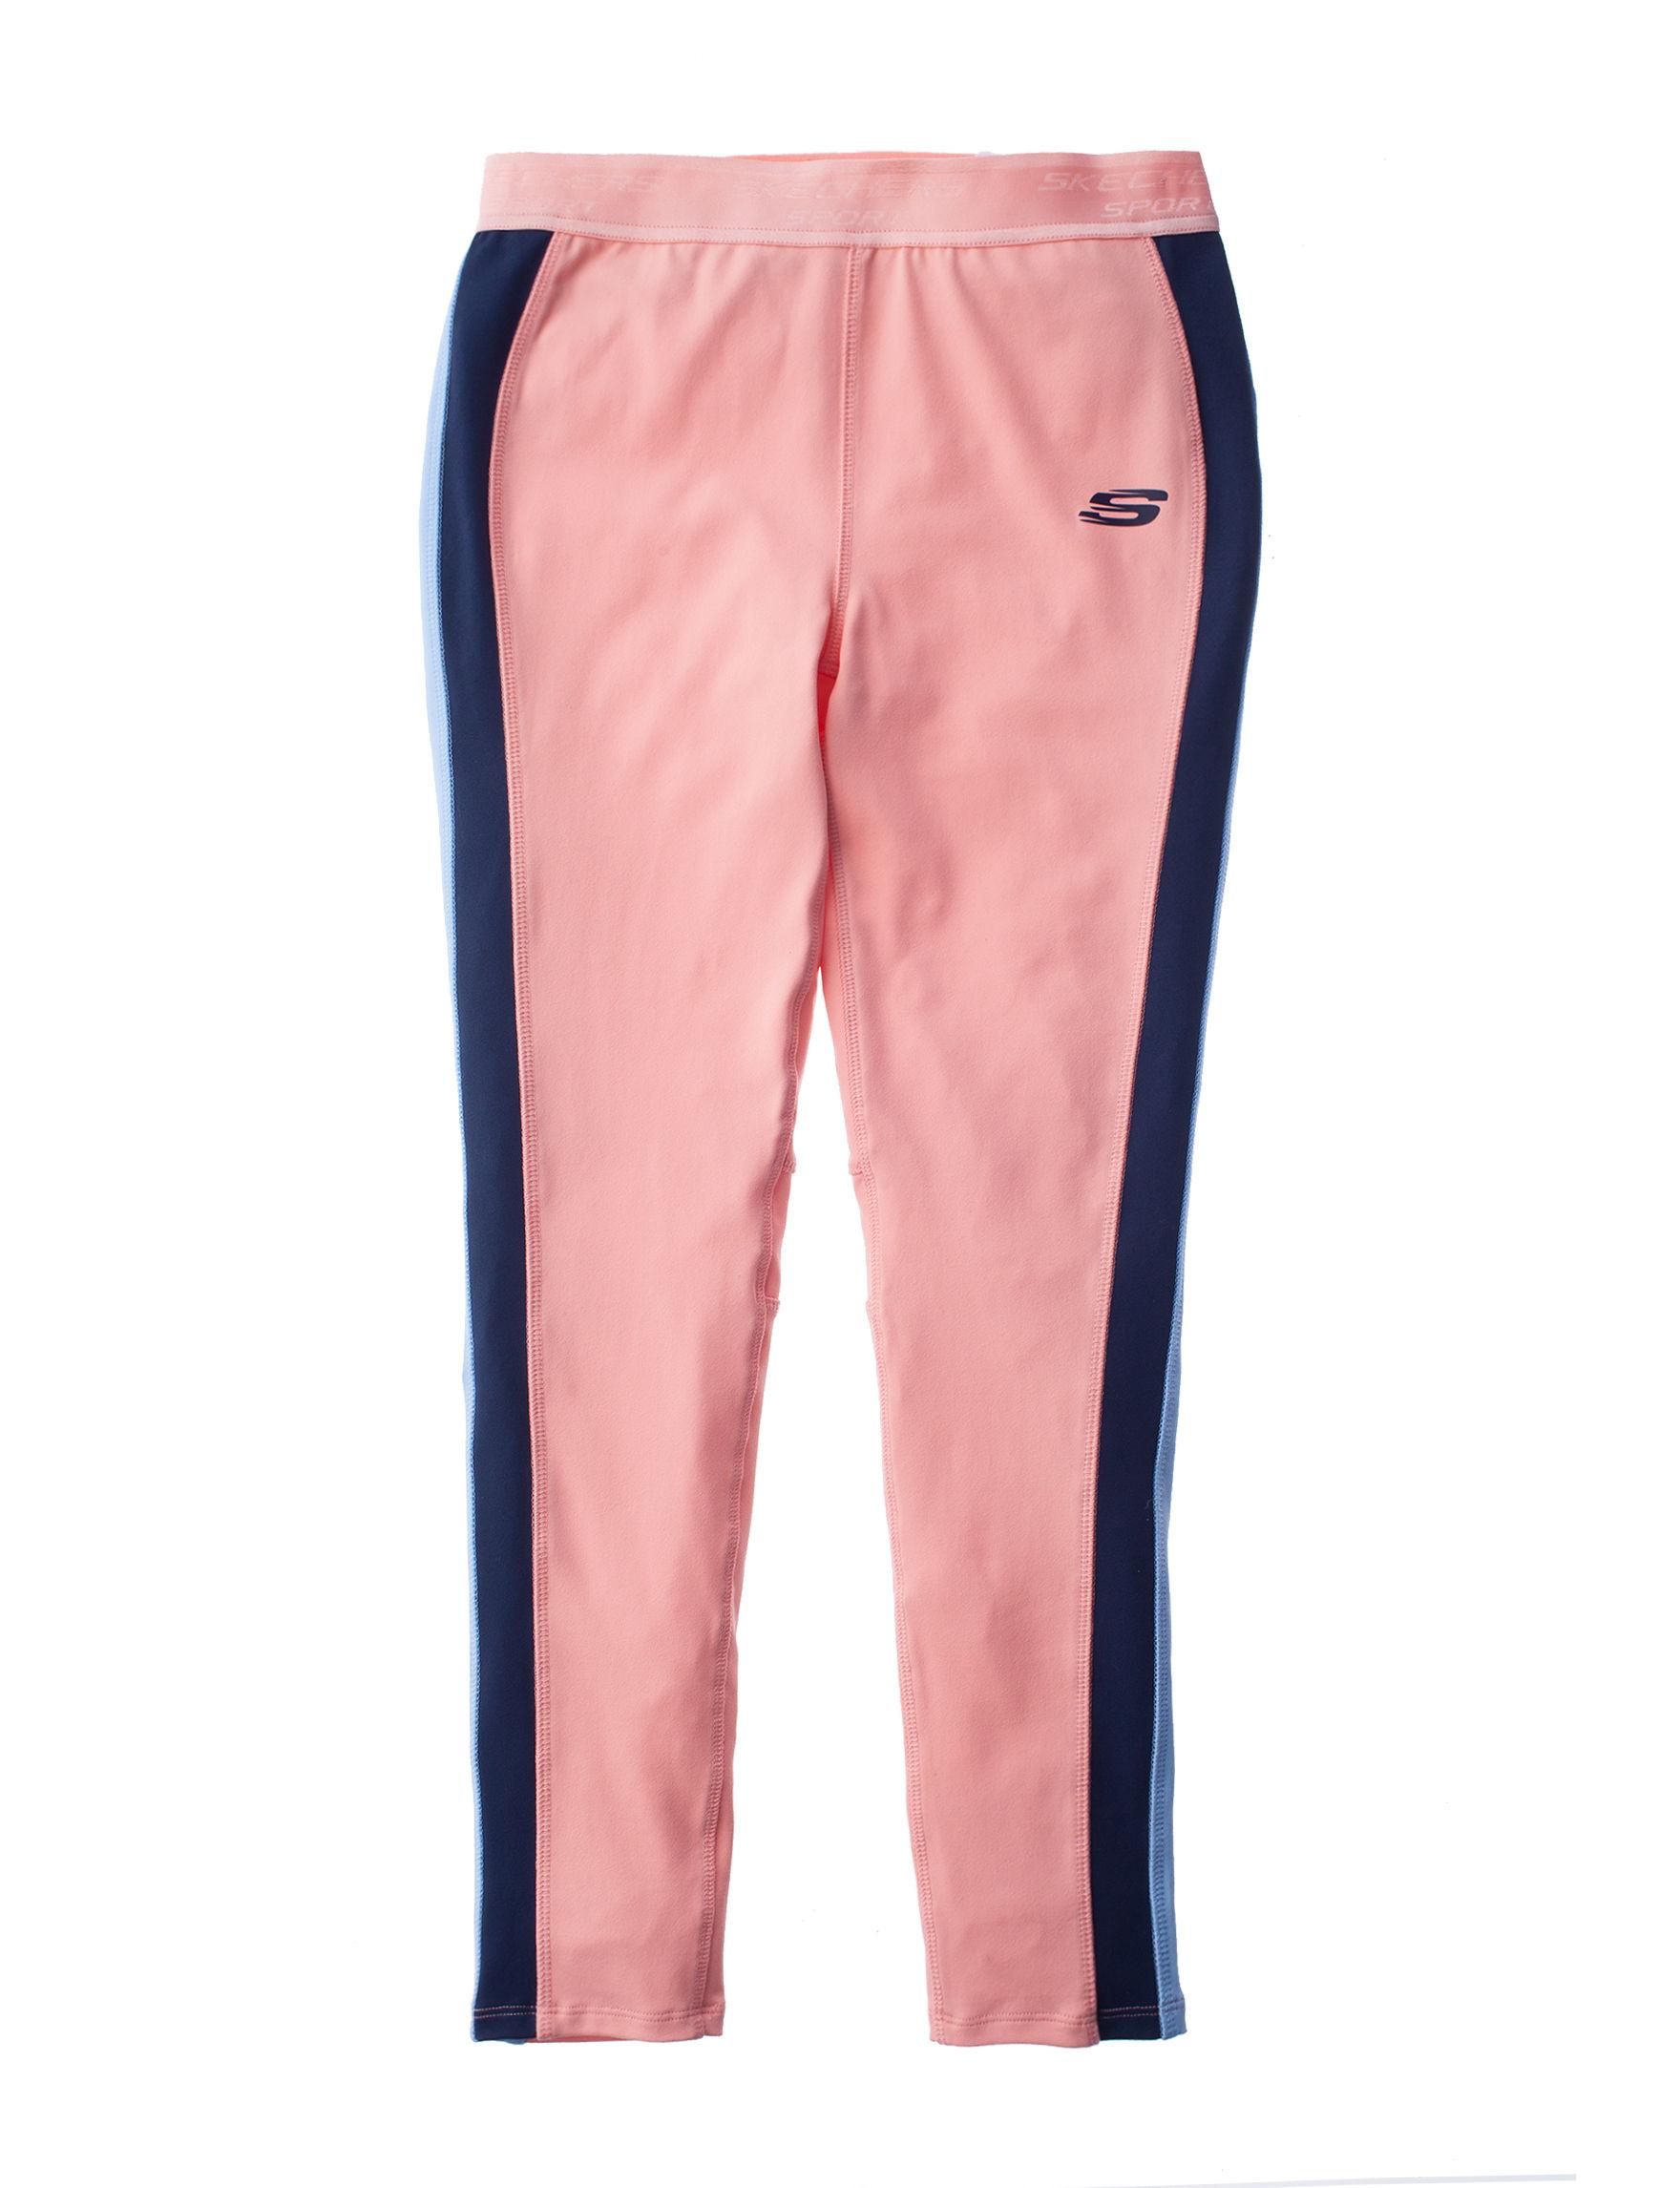 Skechers Peach Leggings